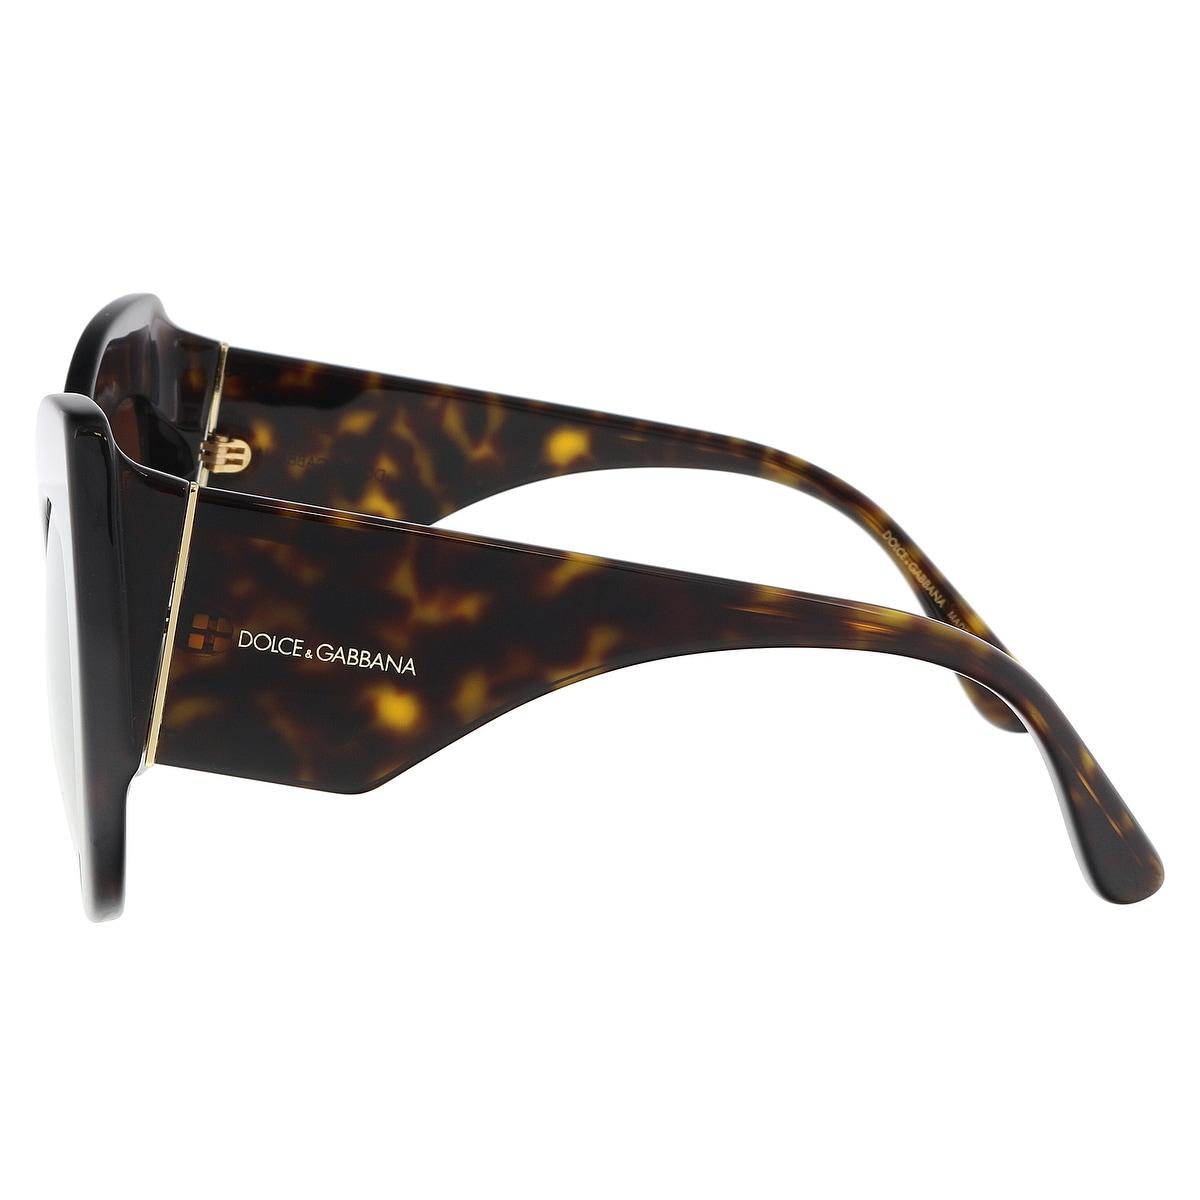 f585a861d5bb Shop Dolce   Gabbana DG4321 502 13 Havana Cat Eye Sunglasses - 55-20 ...